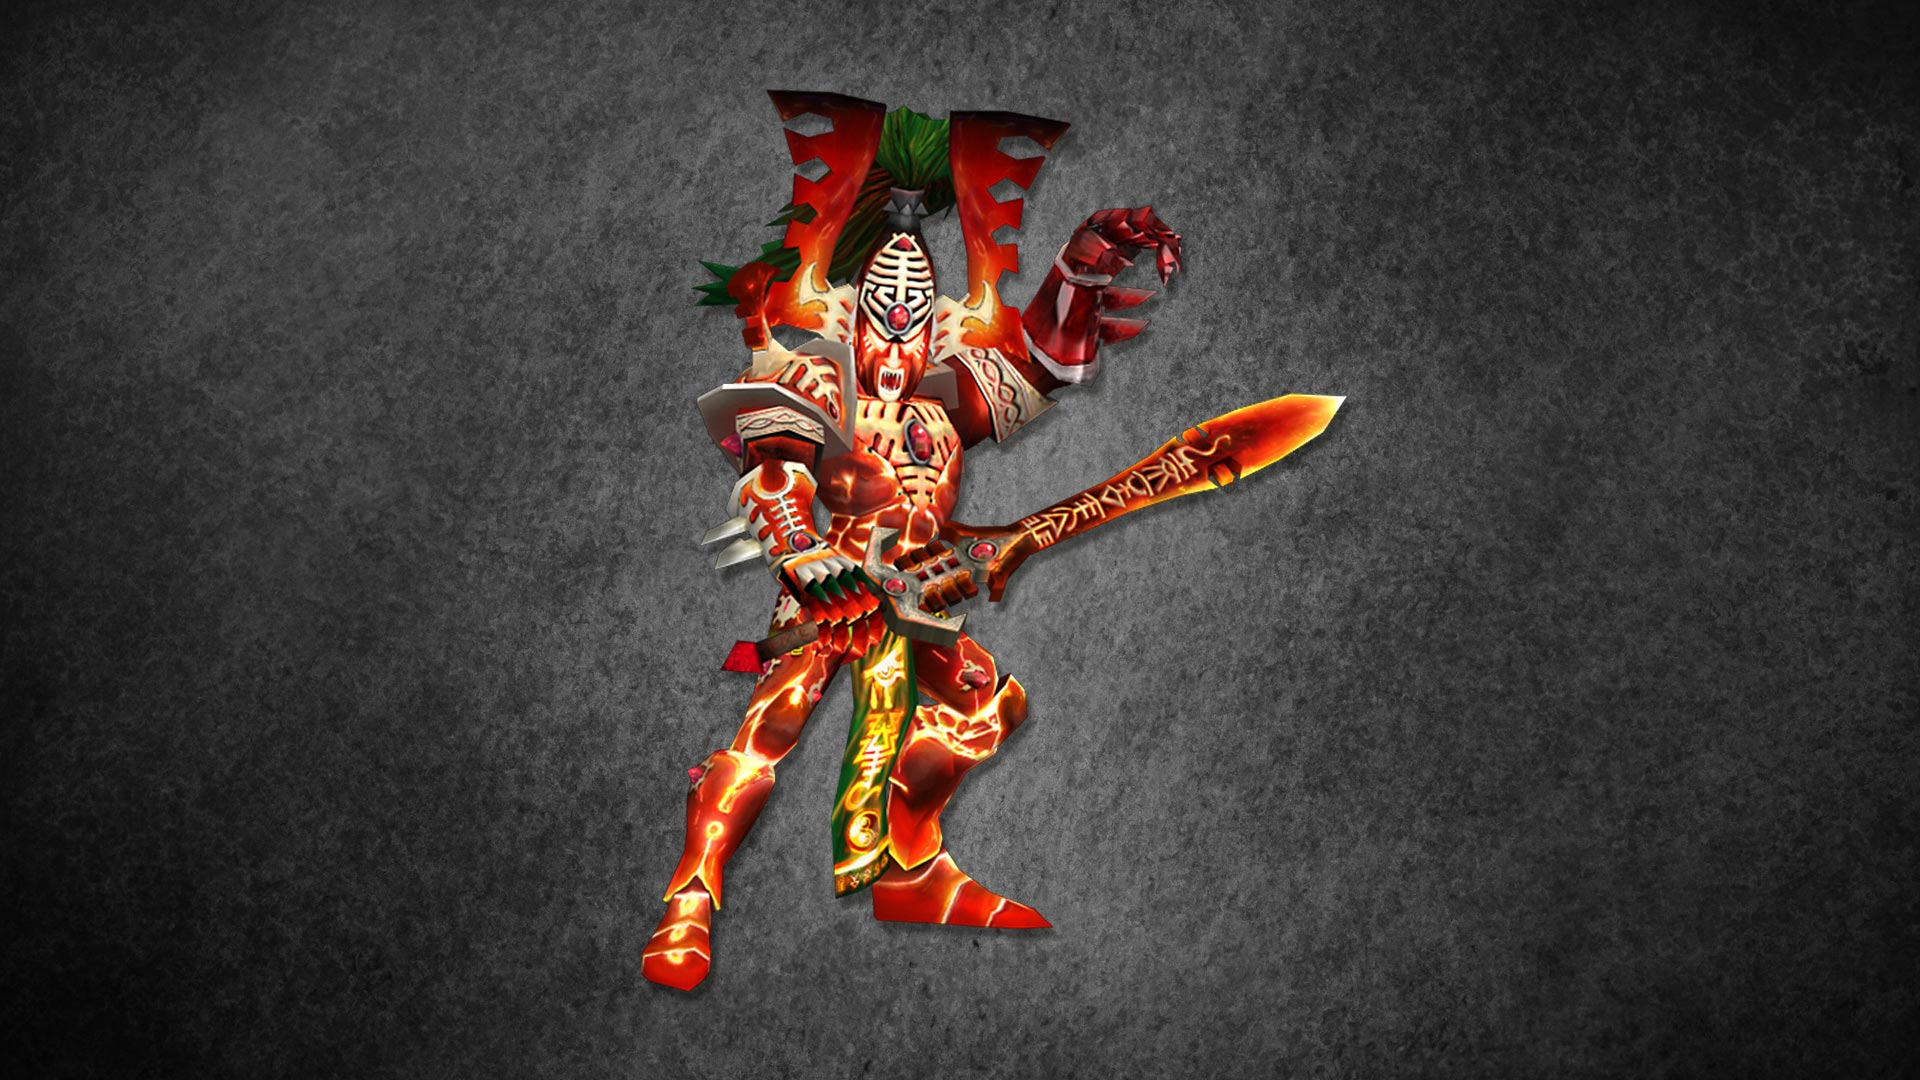 Warhammer 40,000: Dawn of War - GotY - Avatar of Khaine